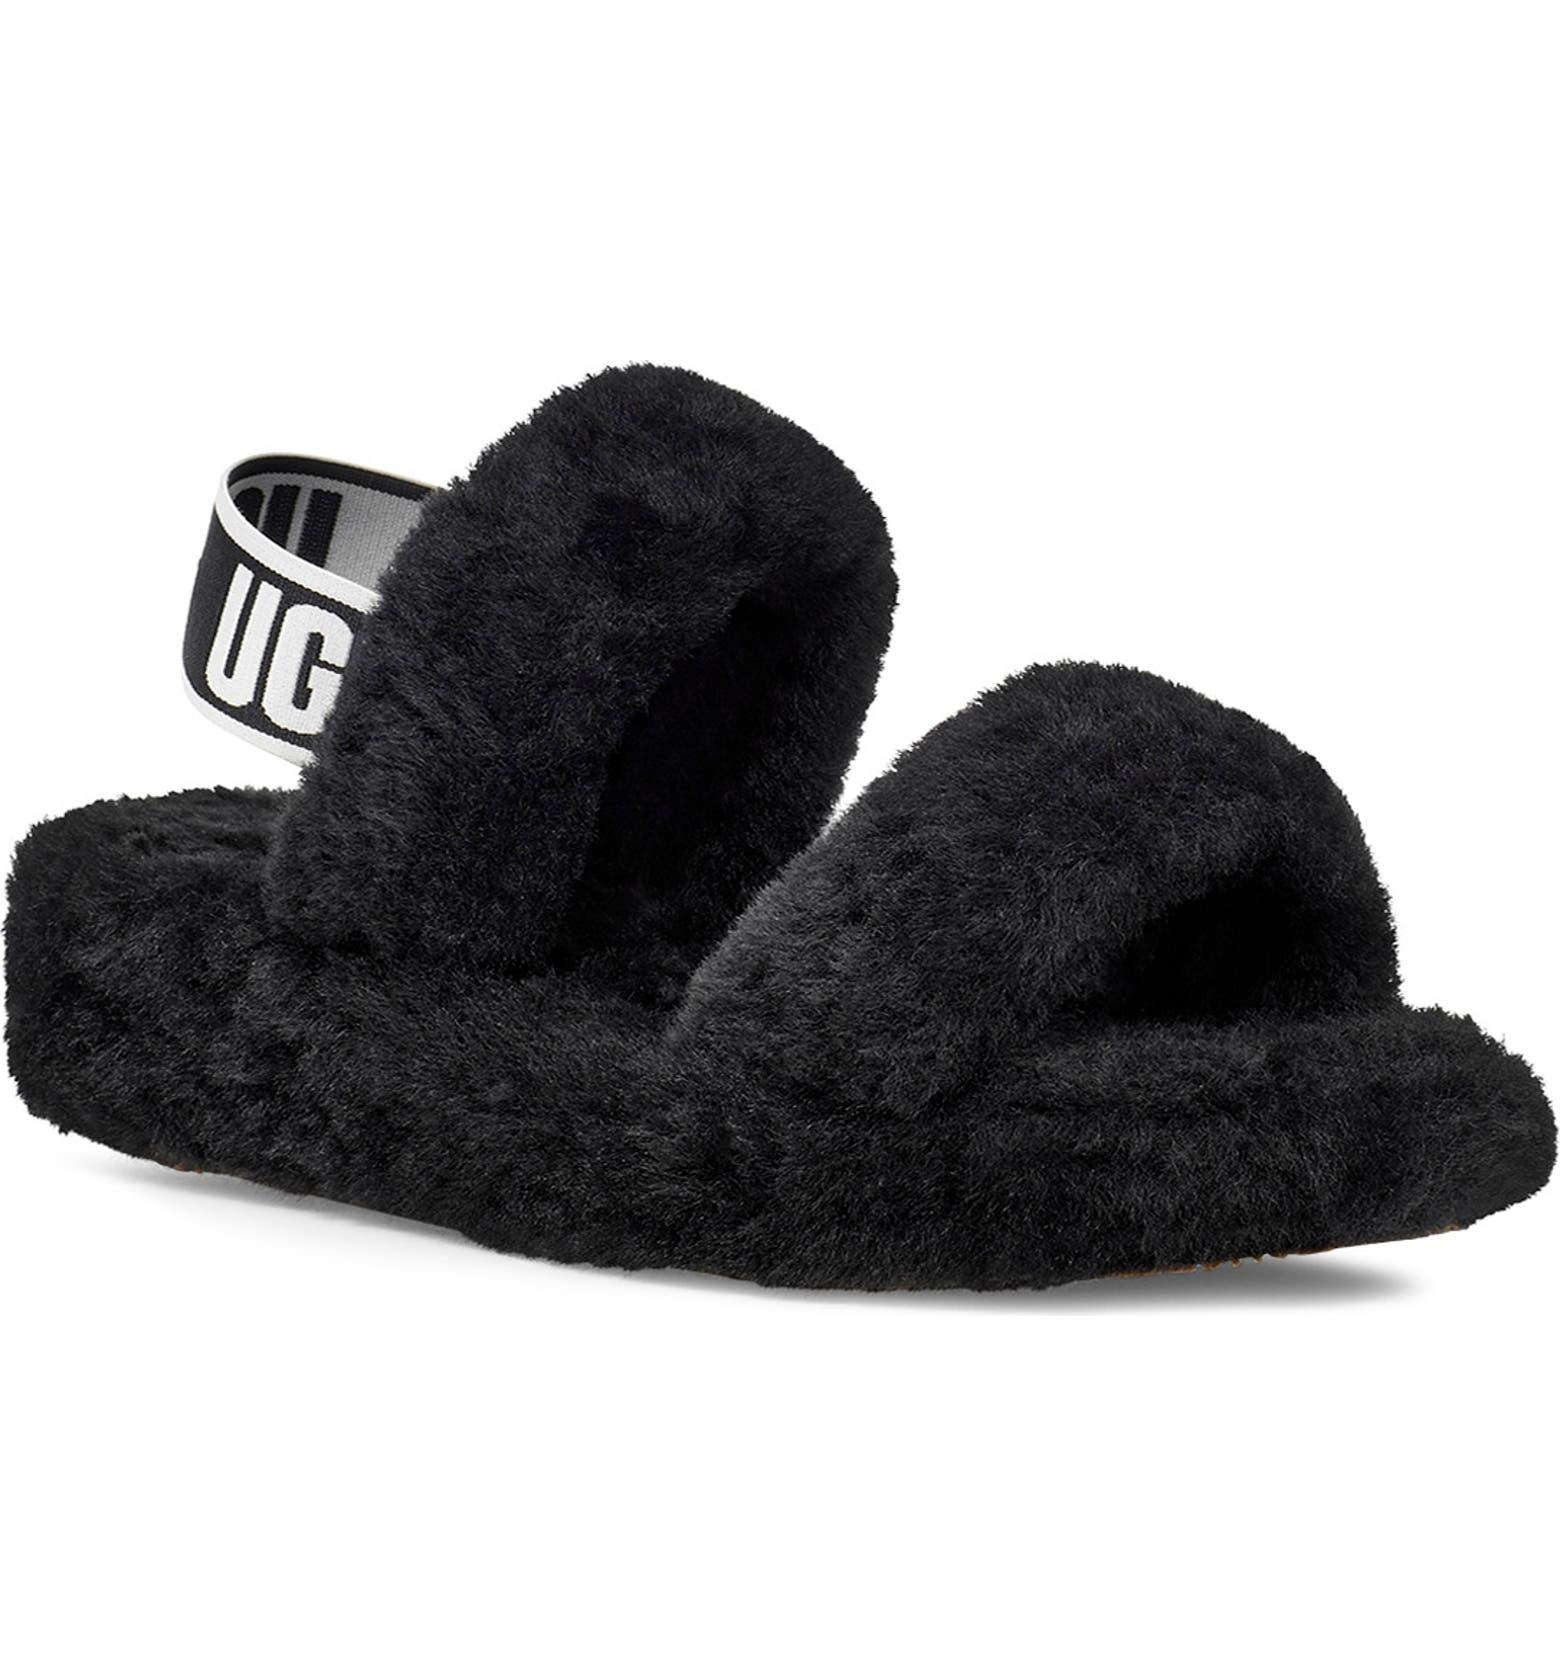 ugg fluff yeah slippers oscars 2021